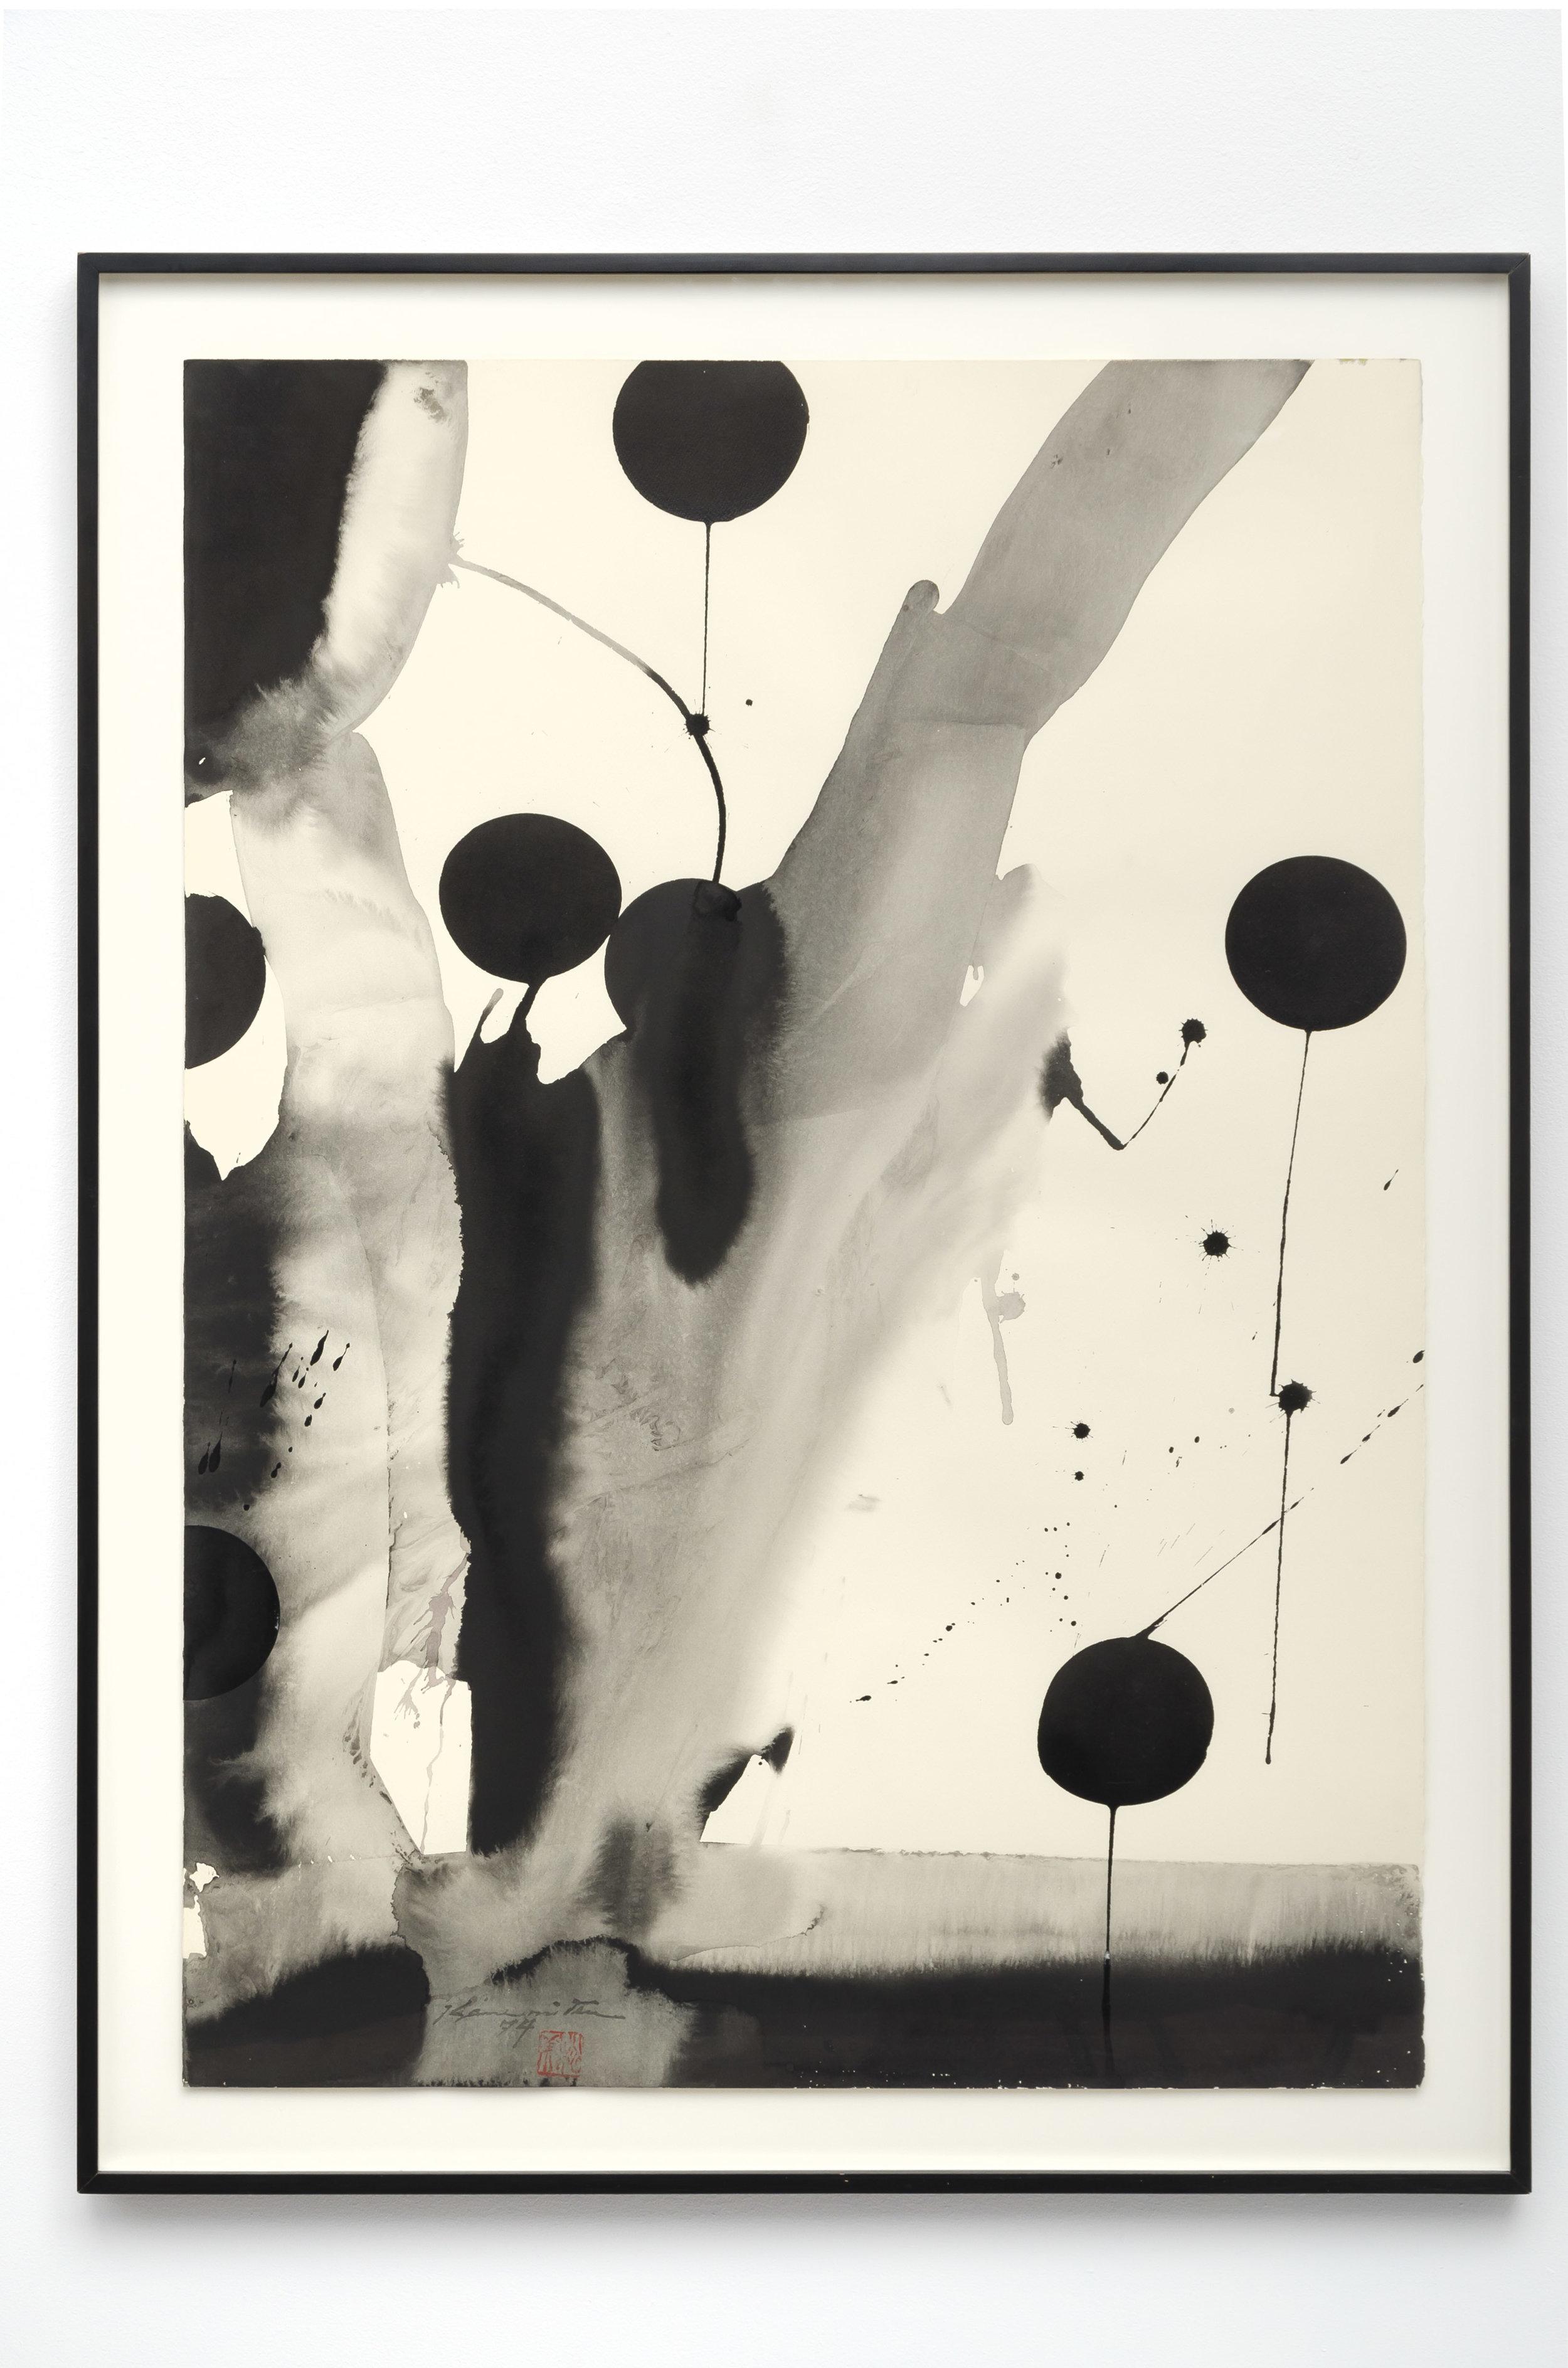 Matsumi Kanemitsu (1922-1992)   Untitled #7450 , 1974 sumi on paper 44 1/2 x 32 3/4 inches; 113 x 83.2 centimeters